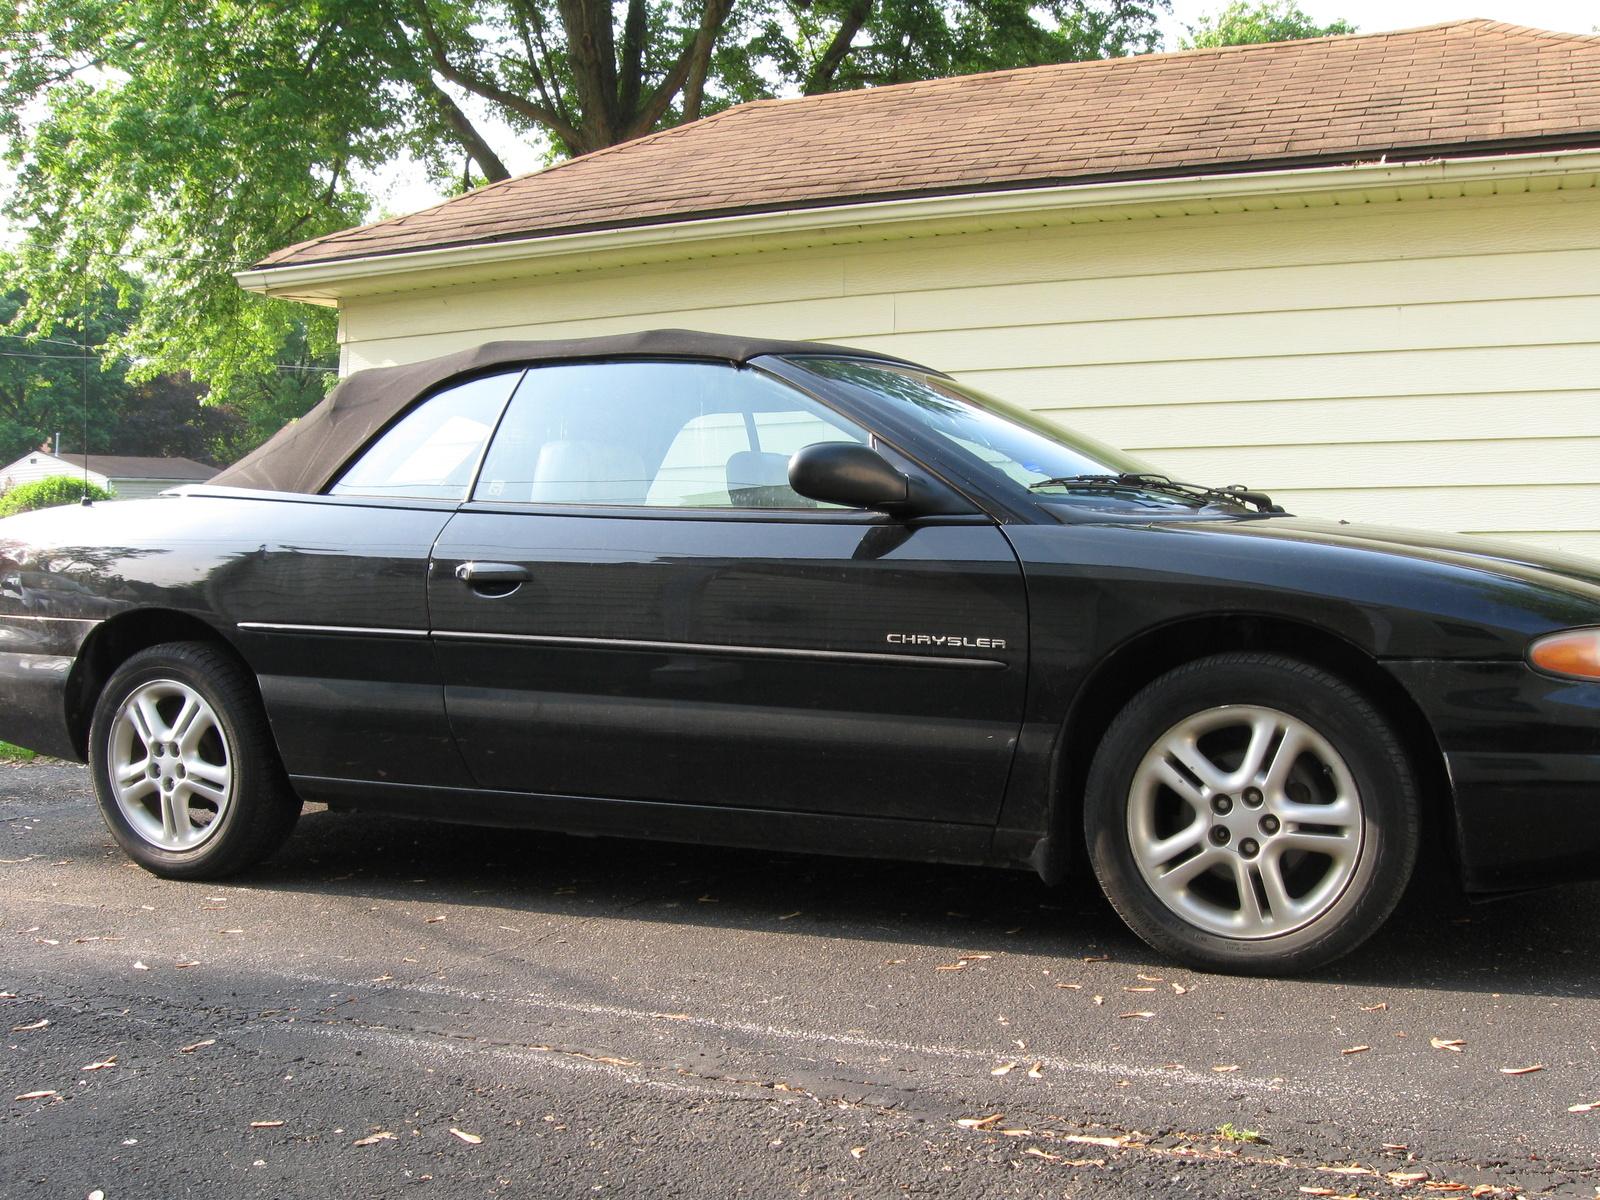 1996 Chrysler Sebring Pictures Cargurus